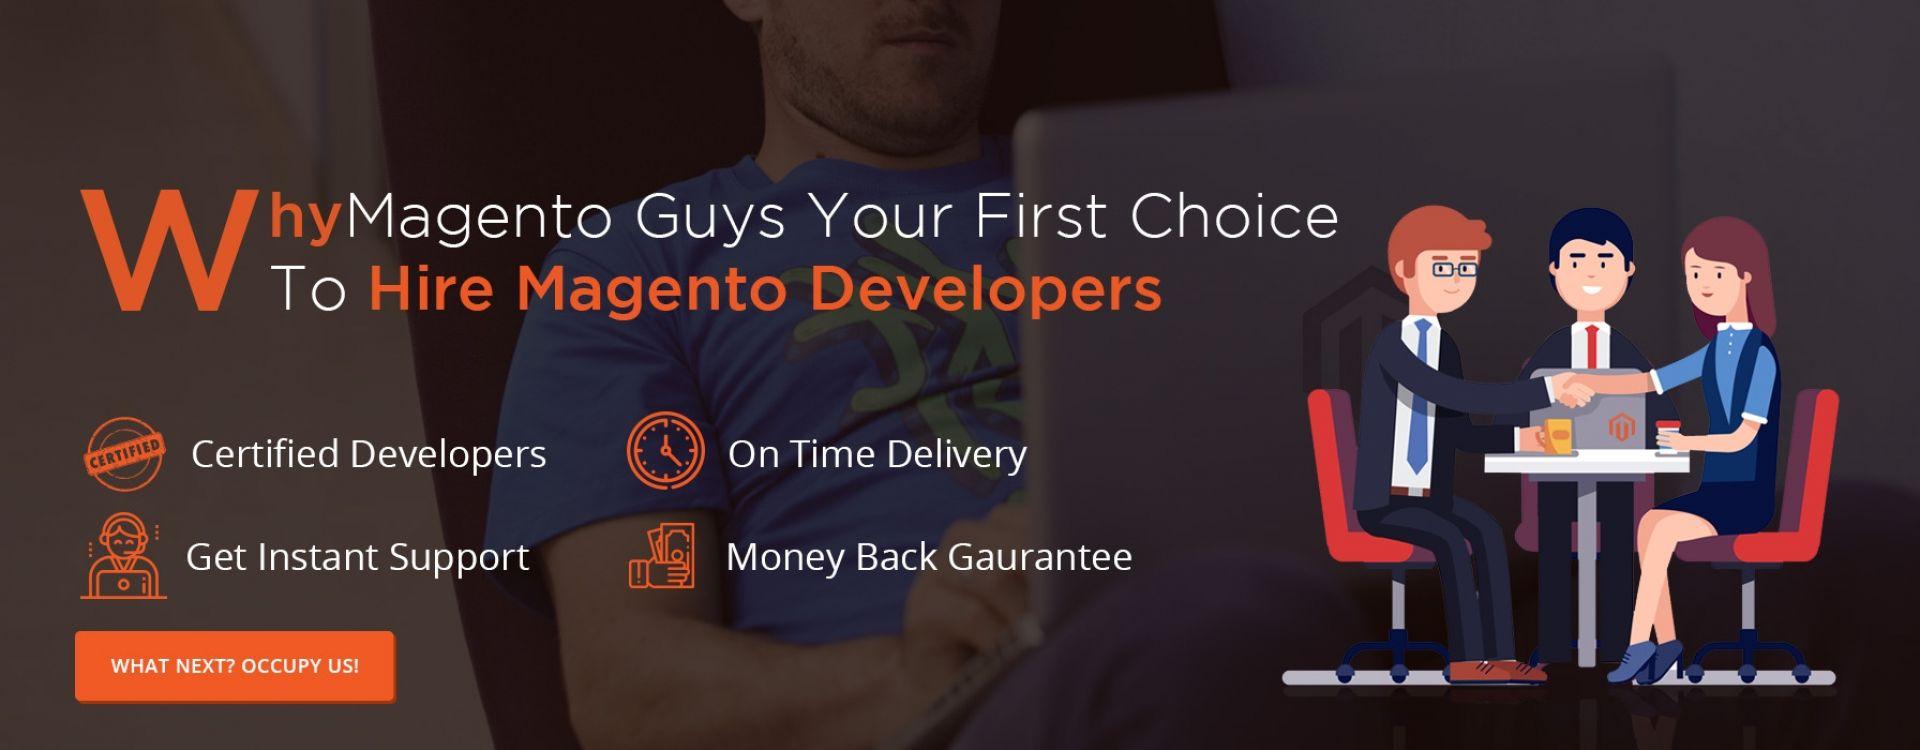 Hire Magento 2 Developers Instant | Magento Developer Freelance